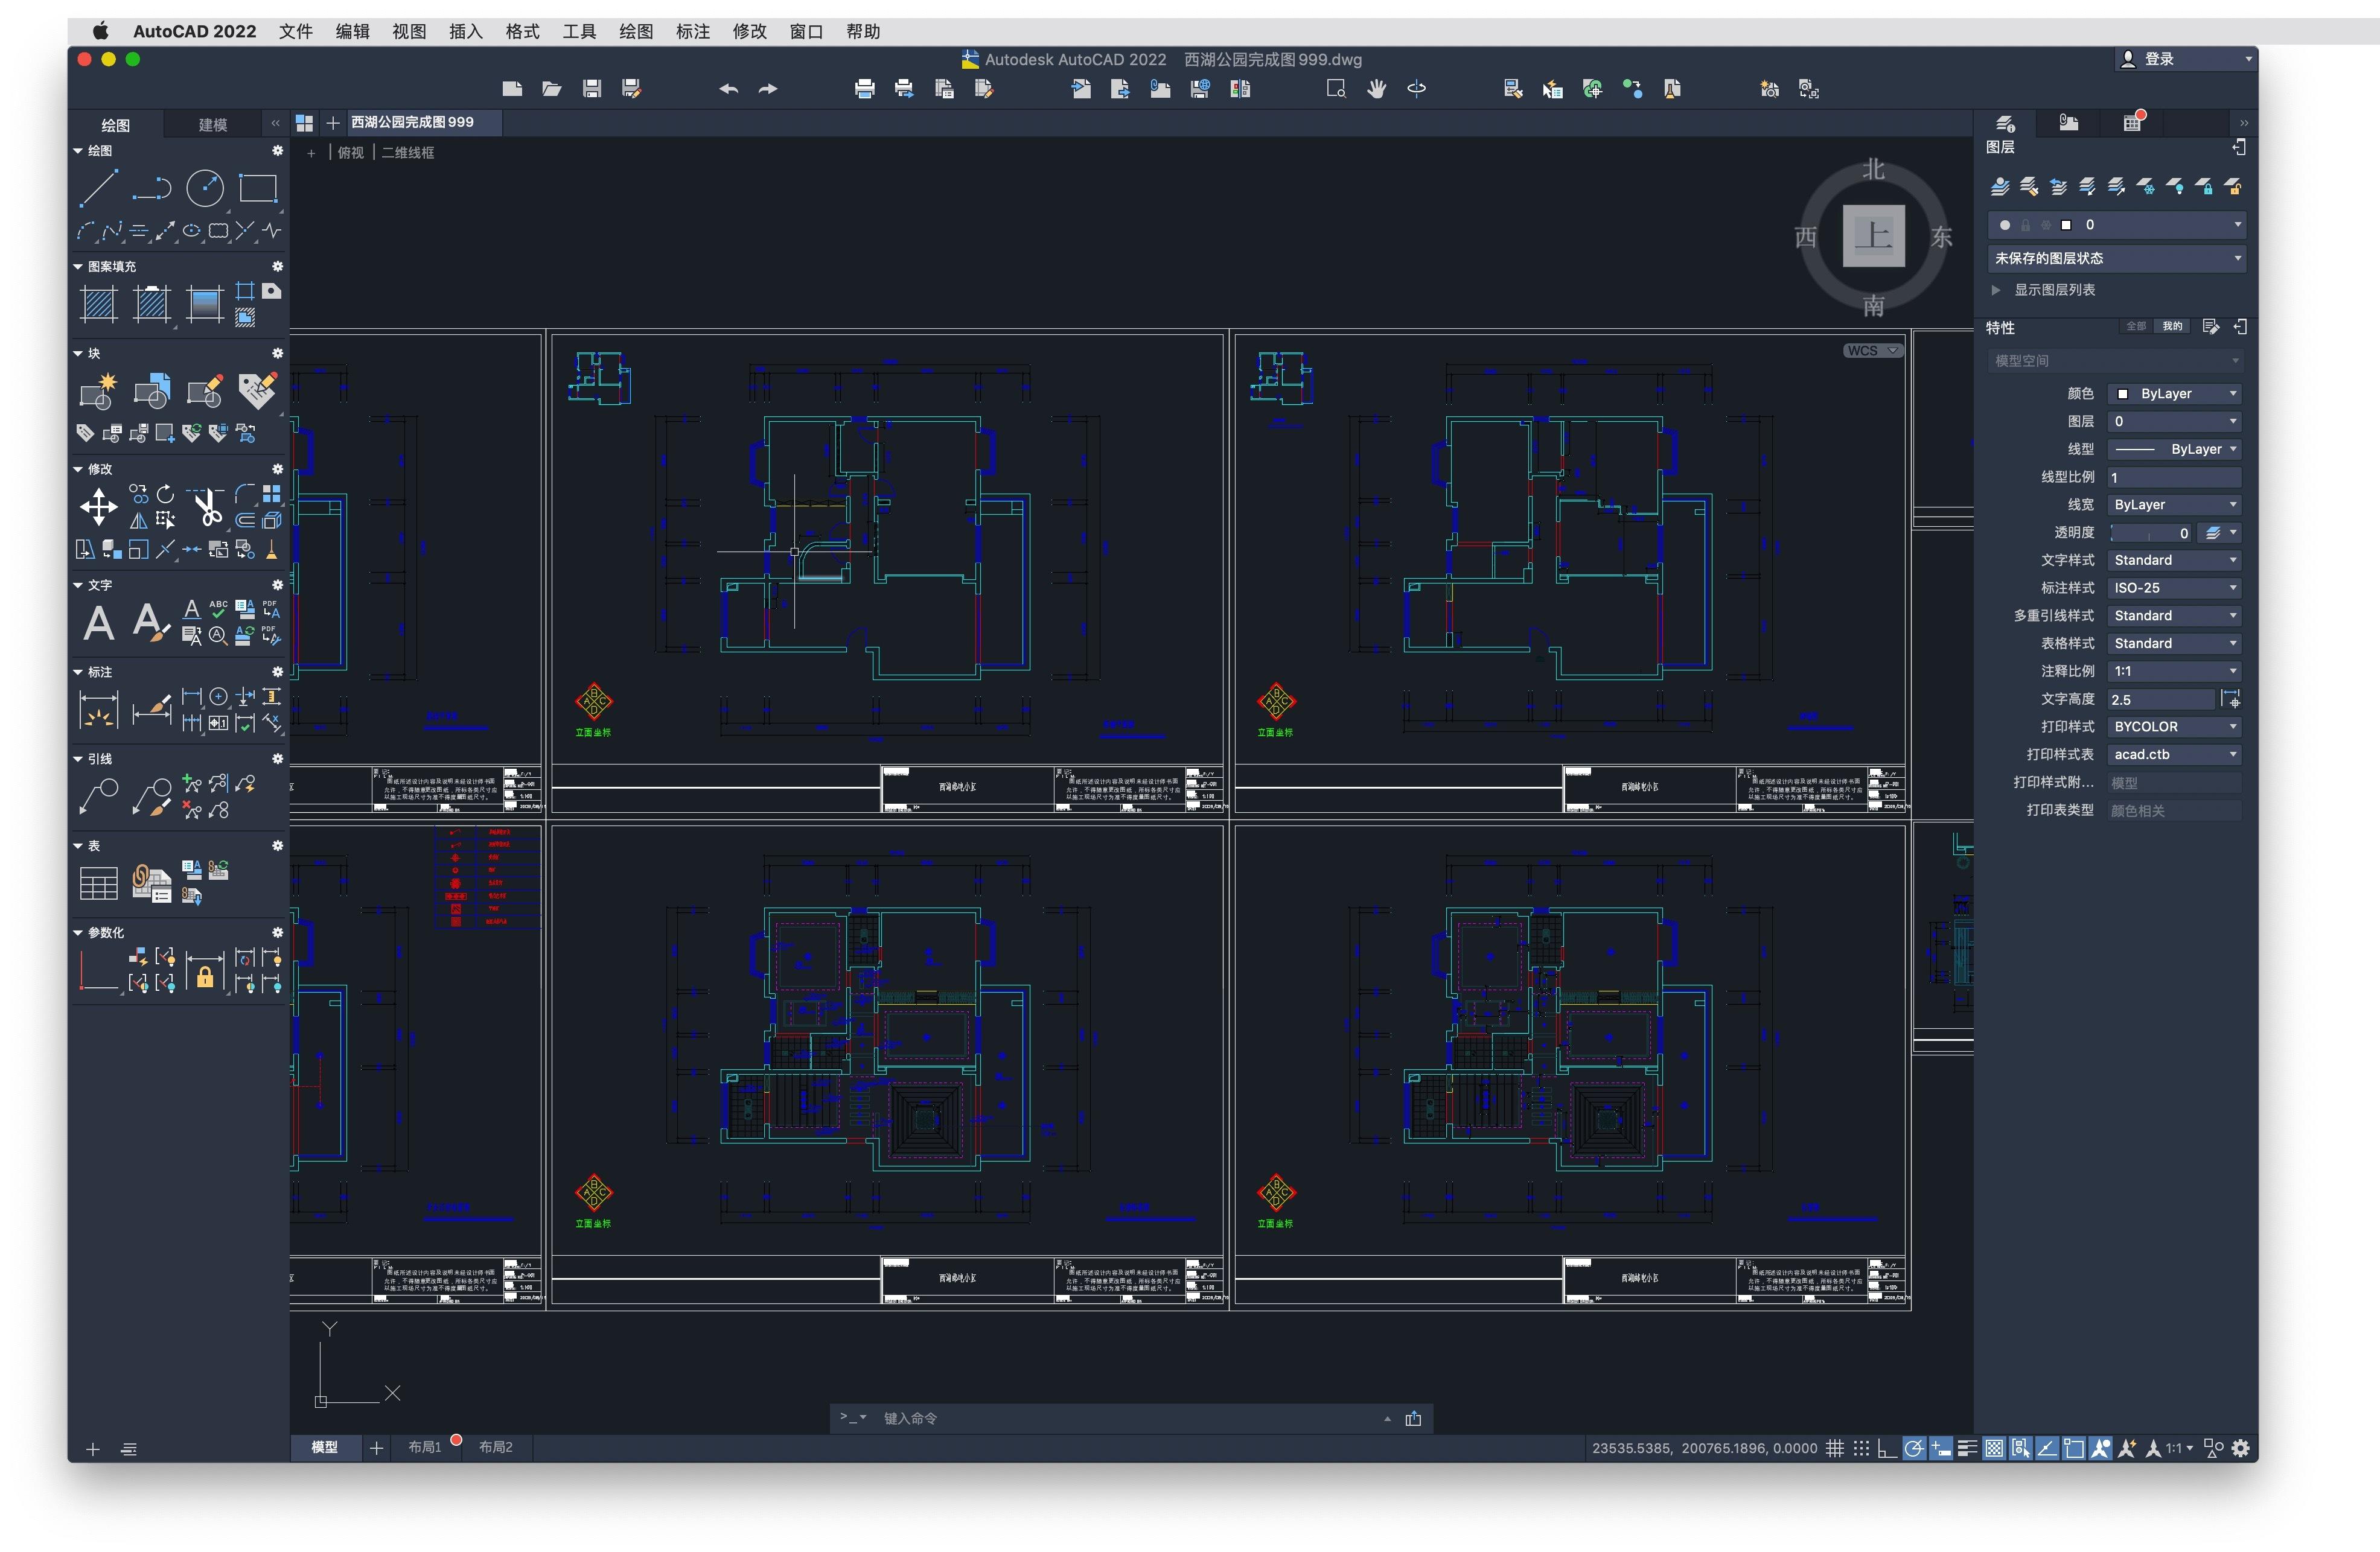 AutoCAD 2022 for Mac 中文破解版 三维制图软件-马克喵